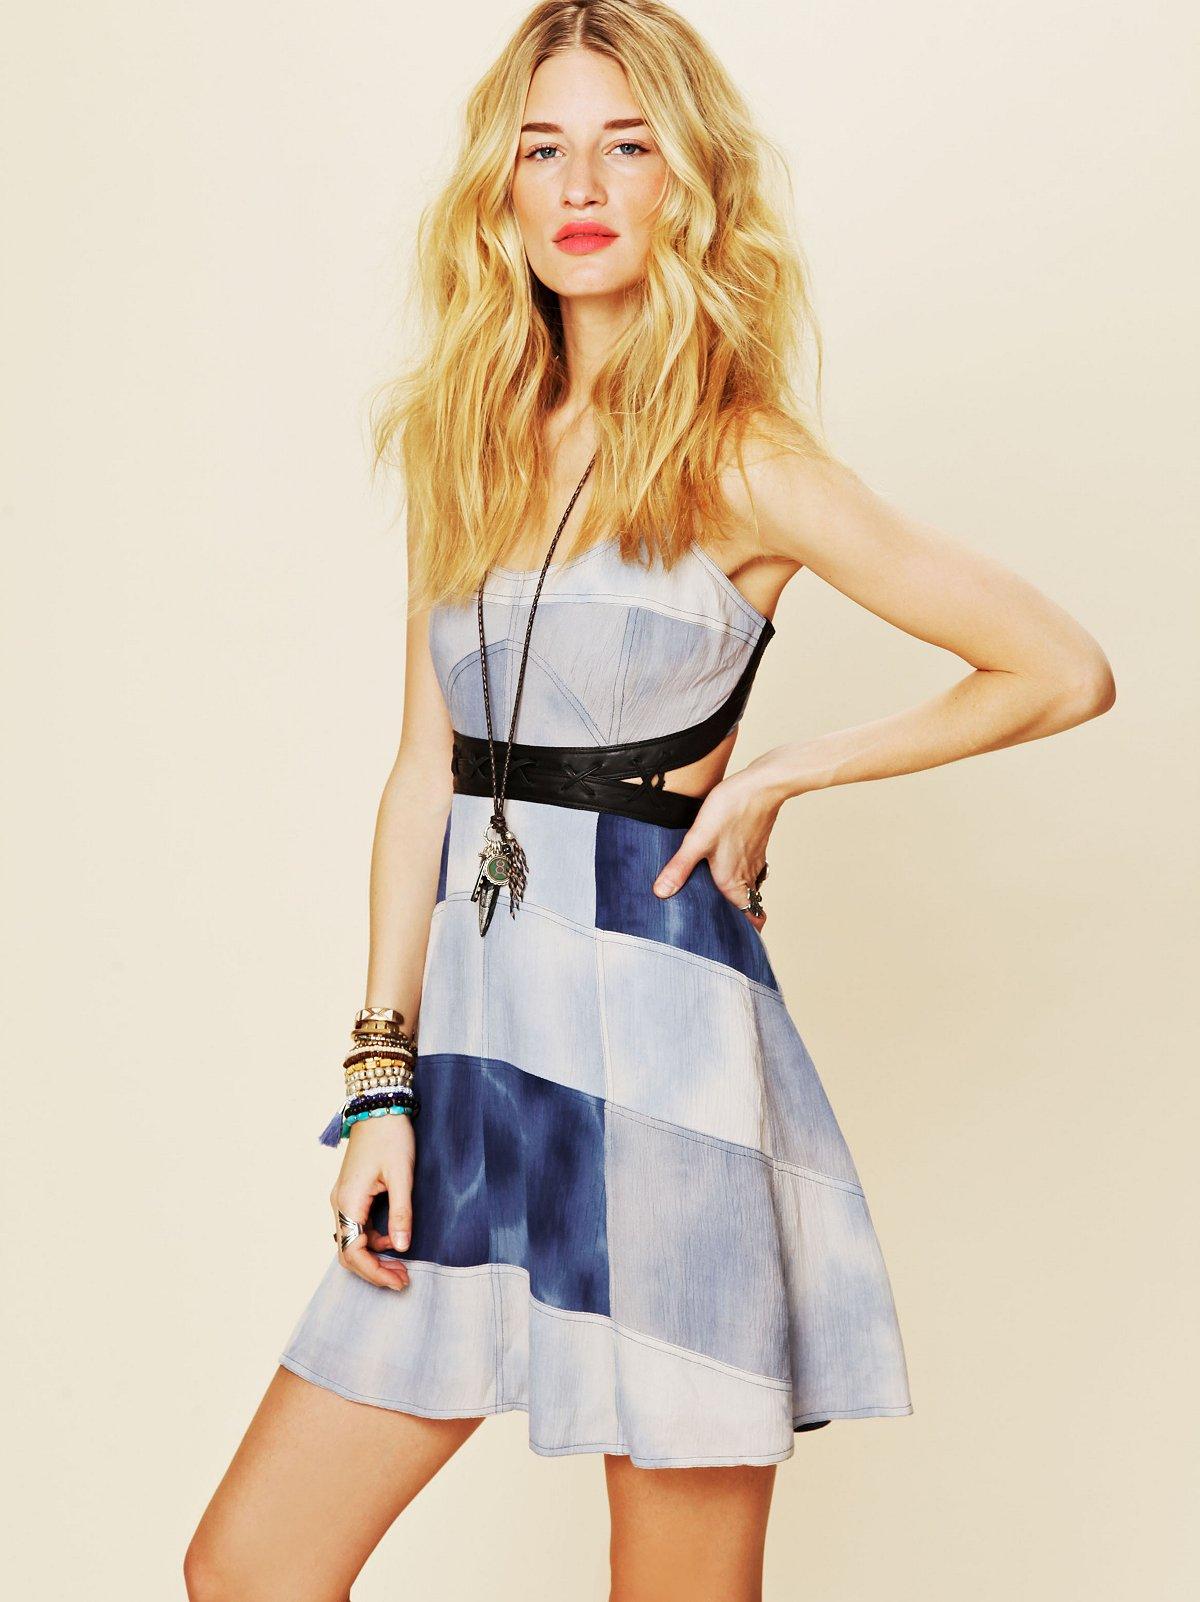 FP New Romantics Hanalee Patchwork Dress